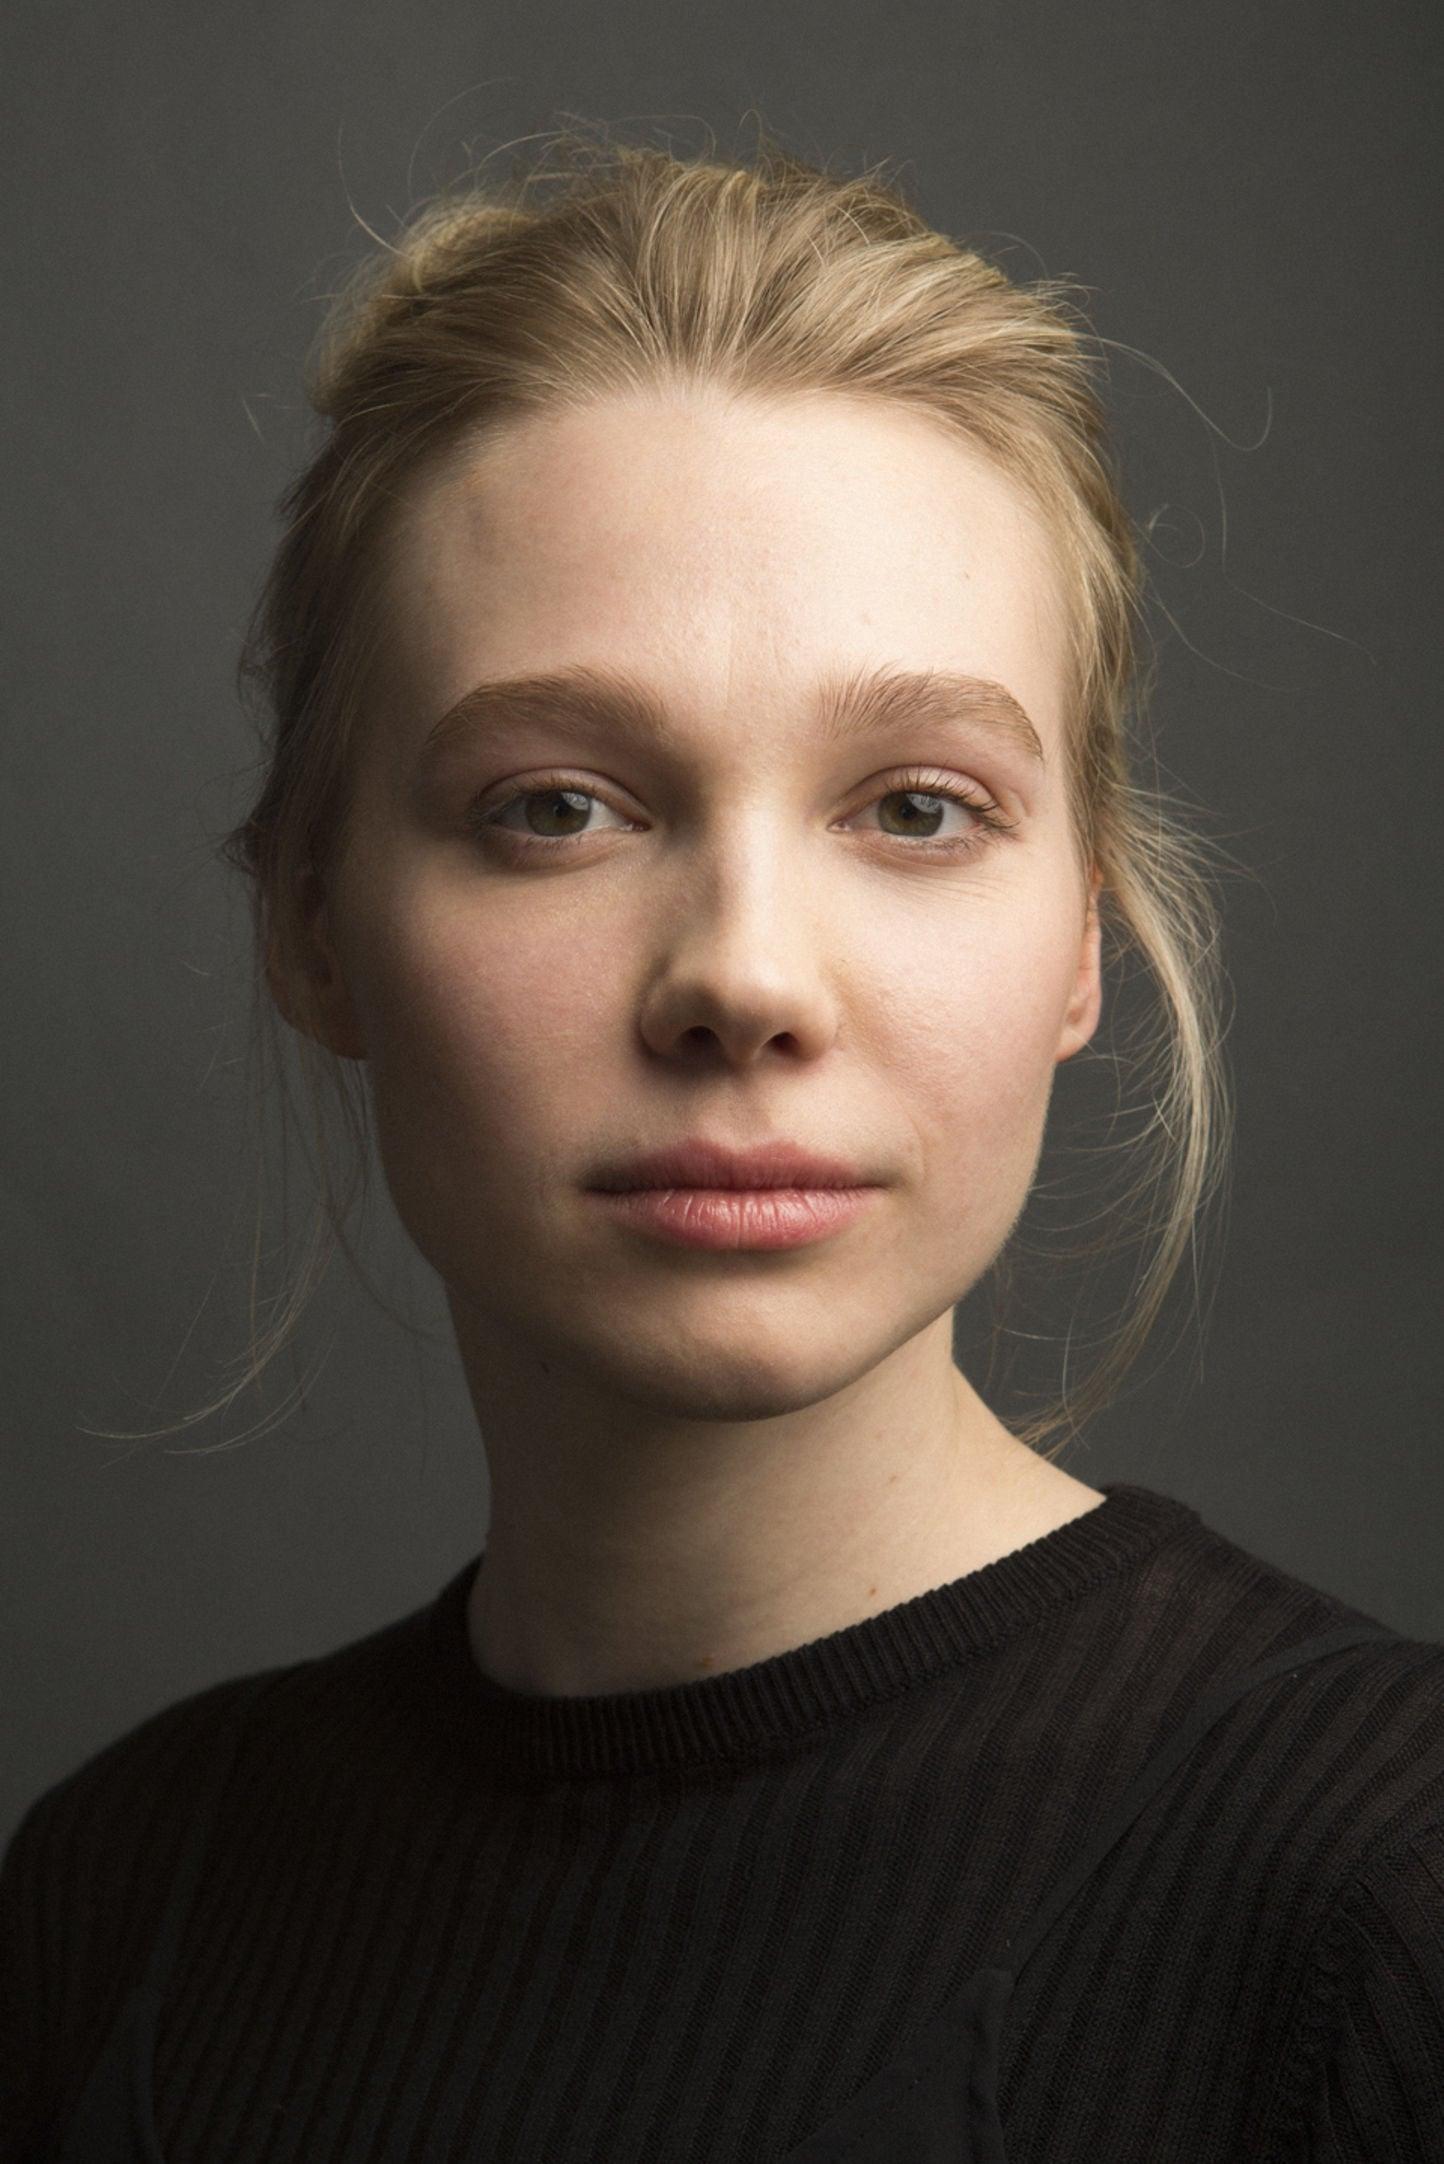 Marina Vasilyeva